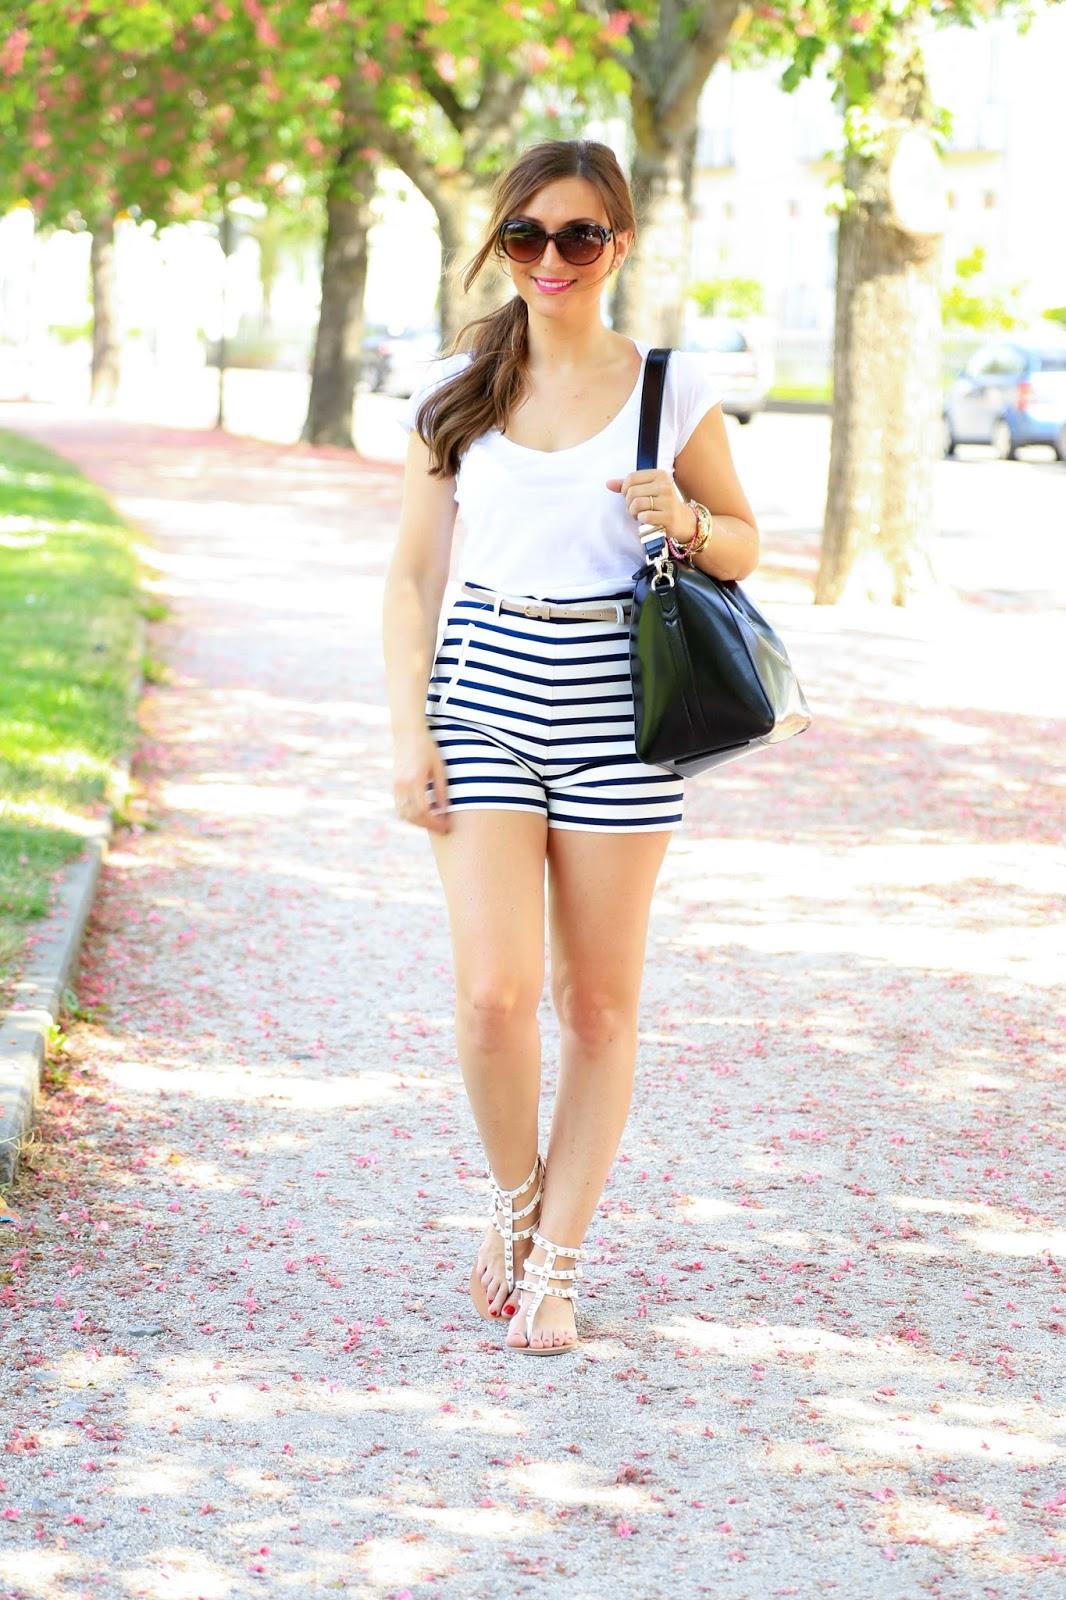 Zara Hose - Streetstyleblogger - Outfitinspiration Fashionblogger - Sommer look 2016 Fashionblogger aus Frankfurt - Frankfurt Fashionblogger - Fashionblog - German Fashionblogger - Fashionstylebyjohanna